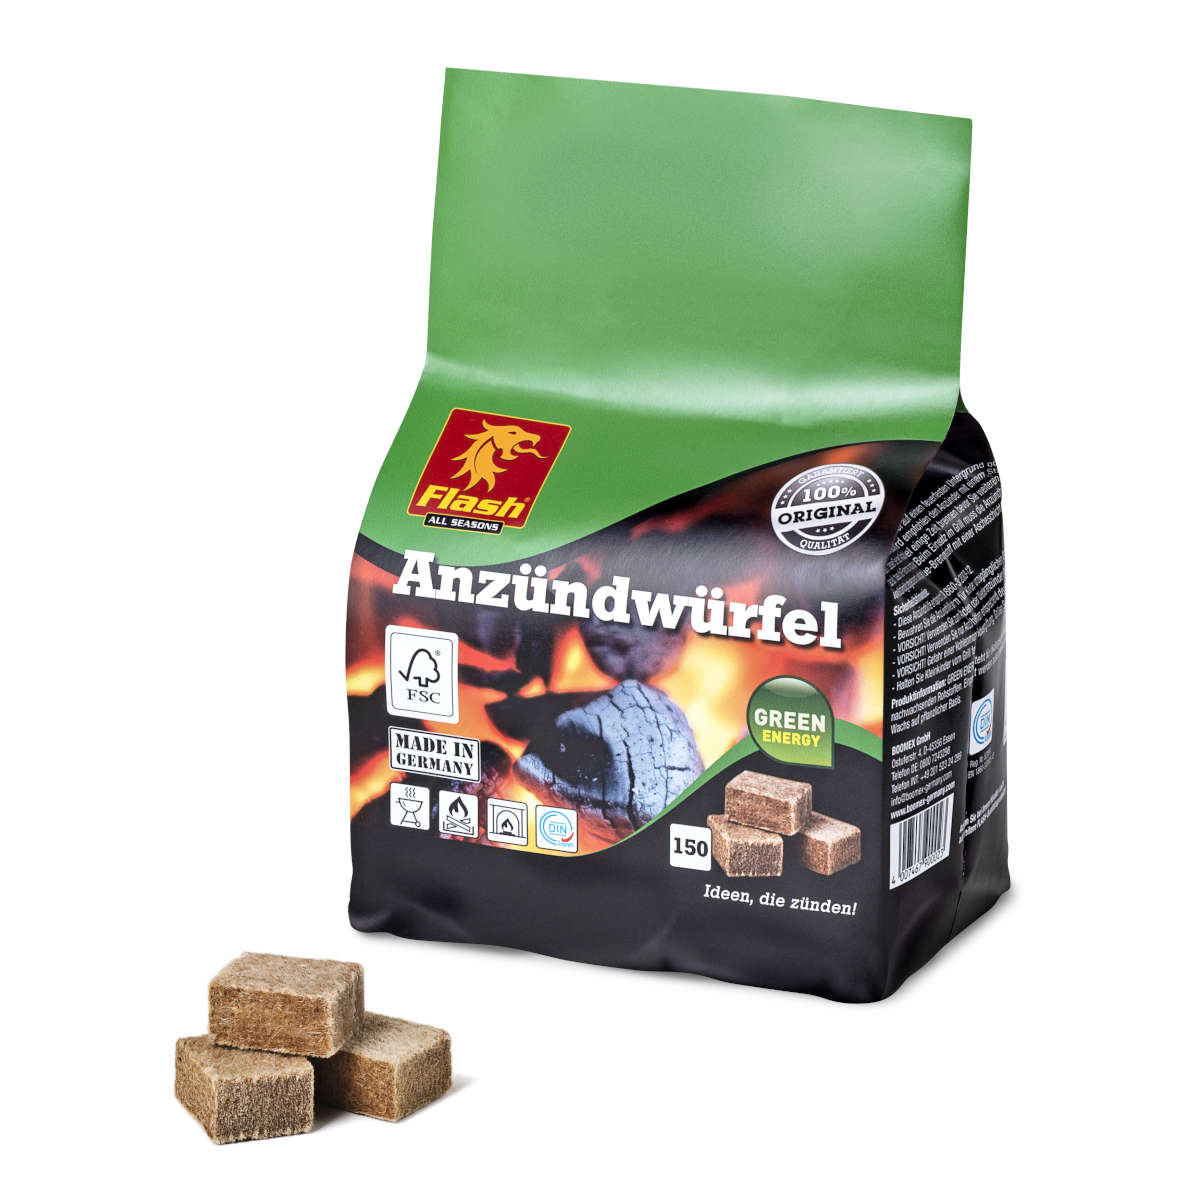 Anzündwürfel Holz und Wachs 150 Stück Beutel